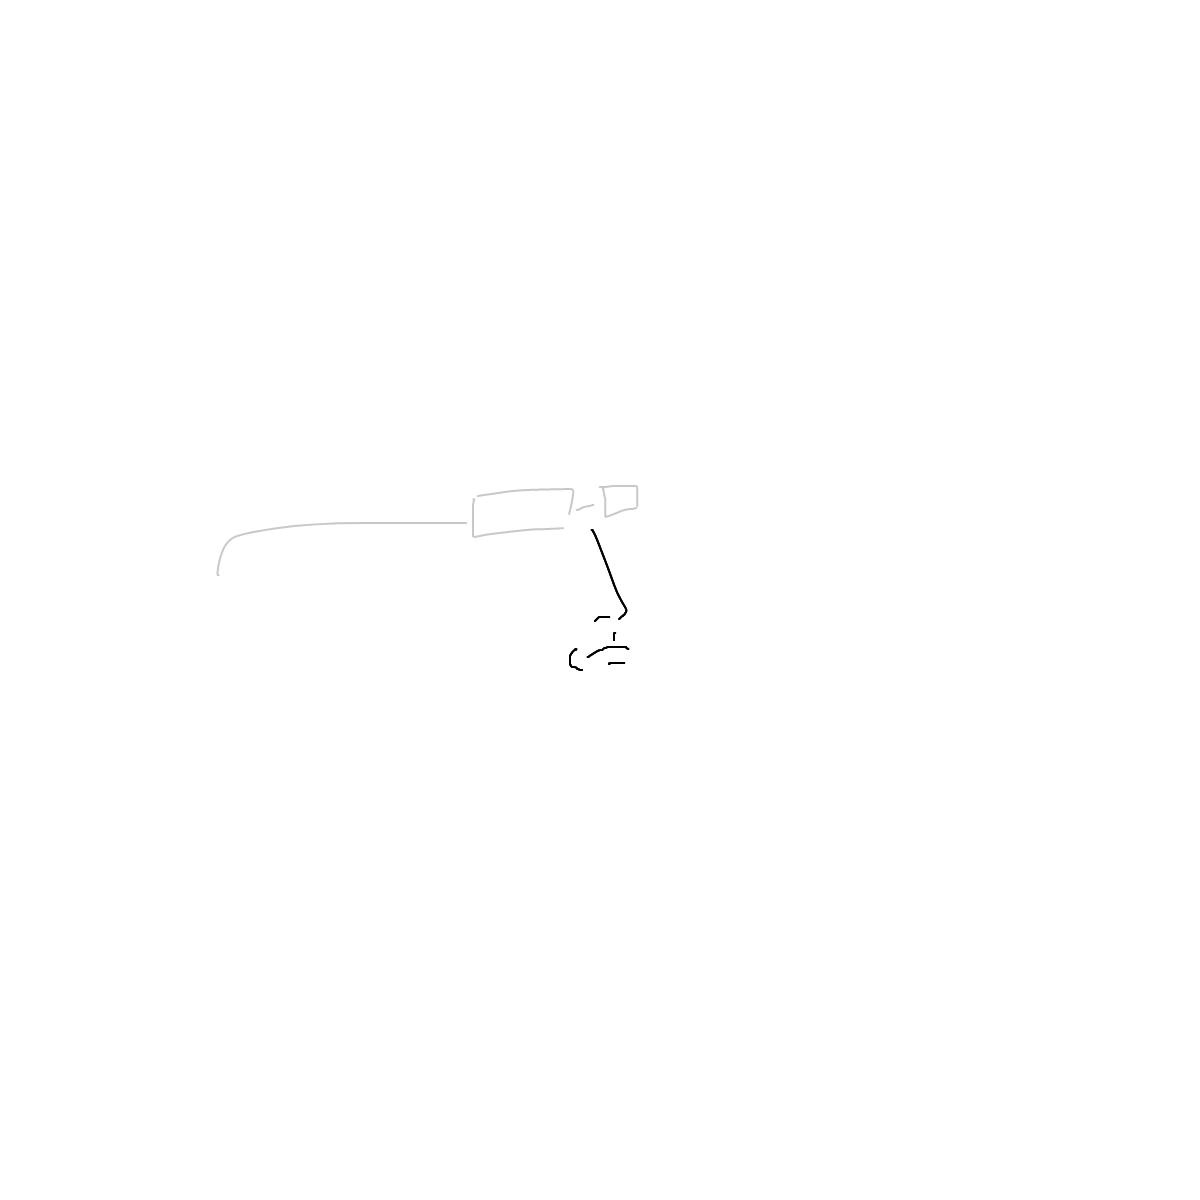 BAAAM drawing#23618 lat:45.7998542785644500lng: 15.9283647537231450